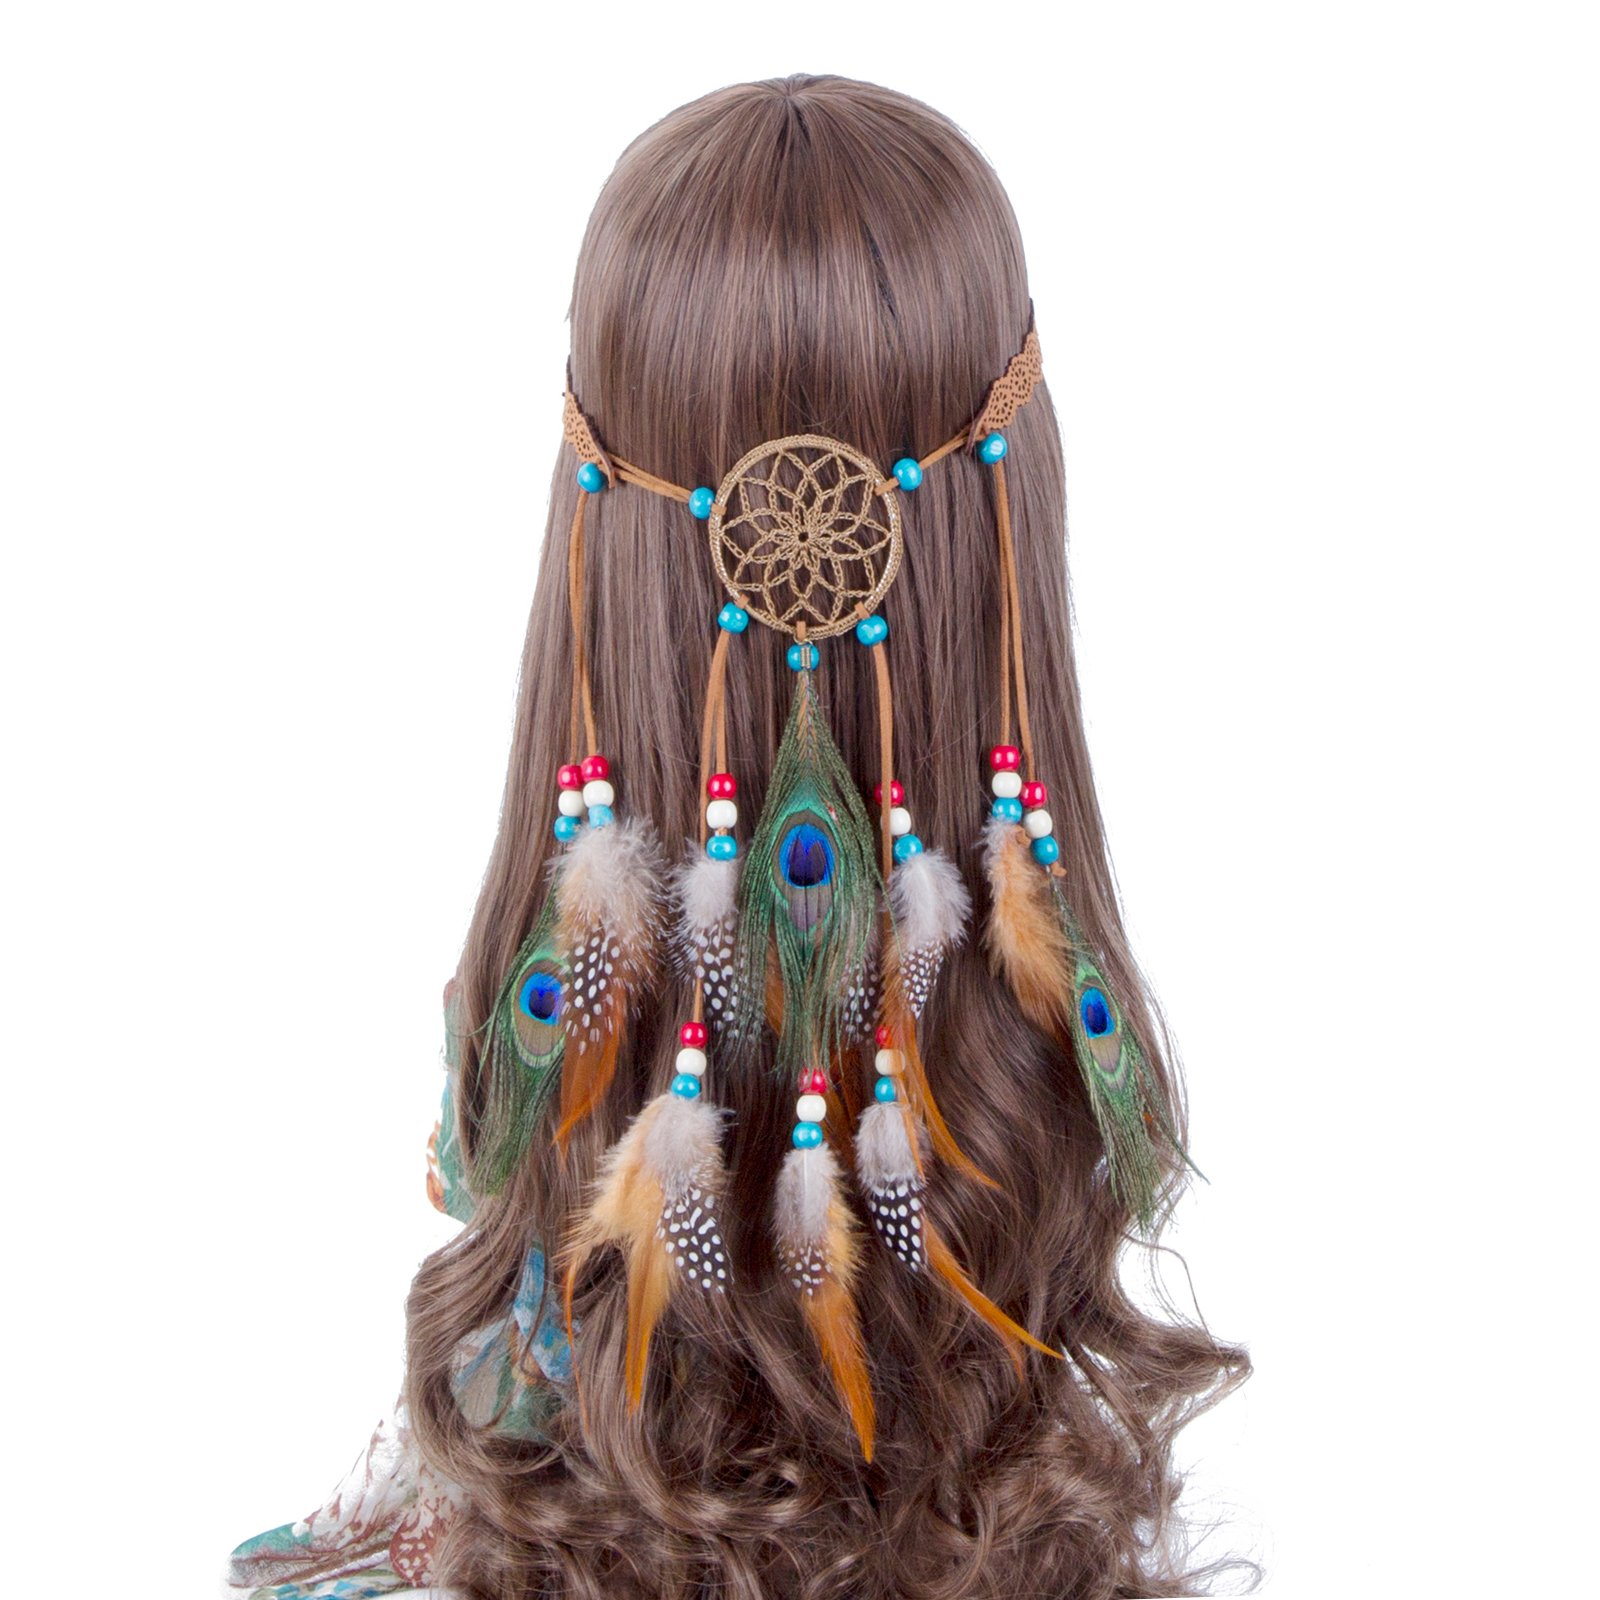 229caee277b9 ... Bags. 15.00. null. Get Quotations · Hippie Headband Feather  Dreamcatcher Headdress - AWAYTR New Fashion Boho Headwear Native American  Headpiece Hippie ...